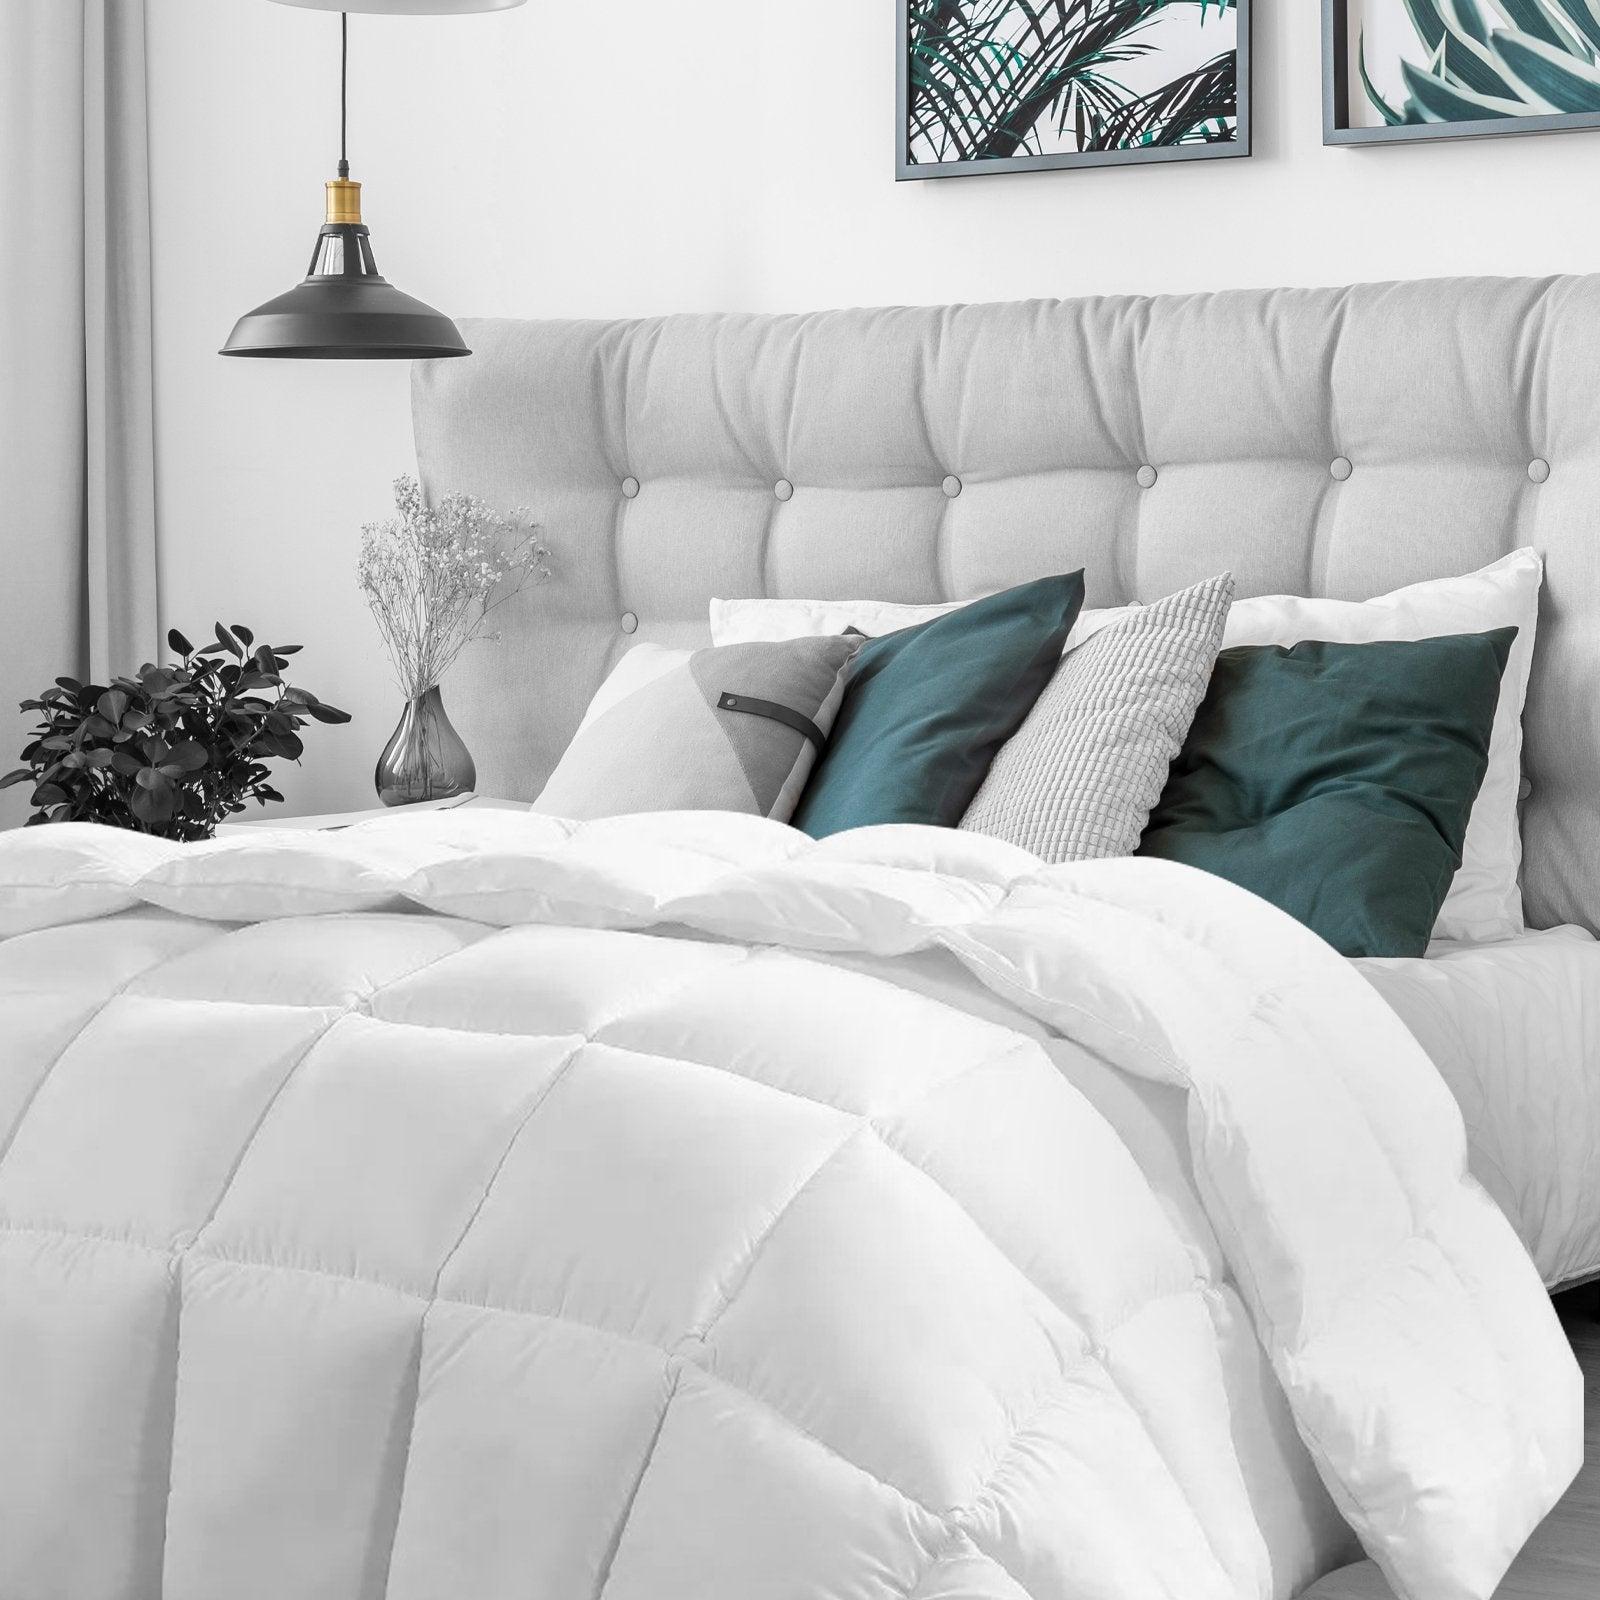 Casa Decor Silk Touch Quilt 360GSM All Seasons Antibacterial Hypoallergenic